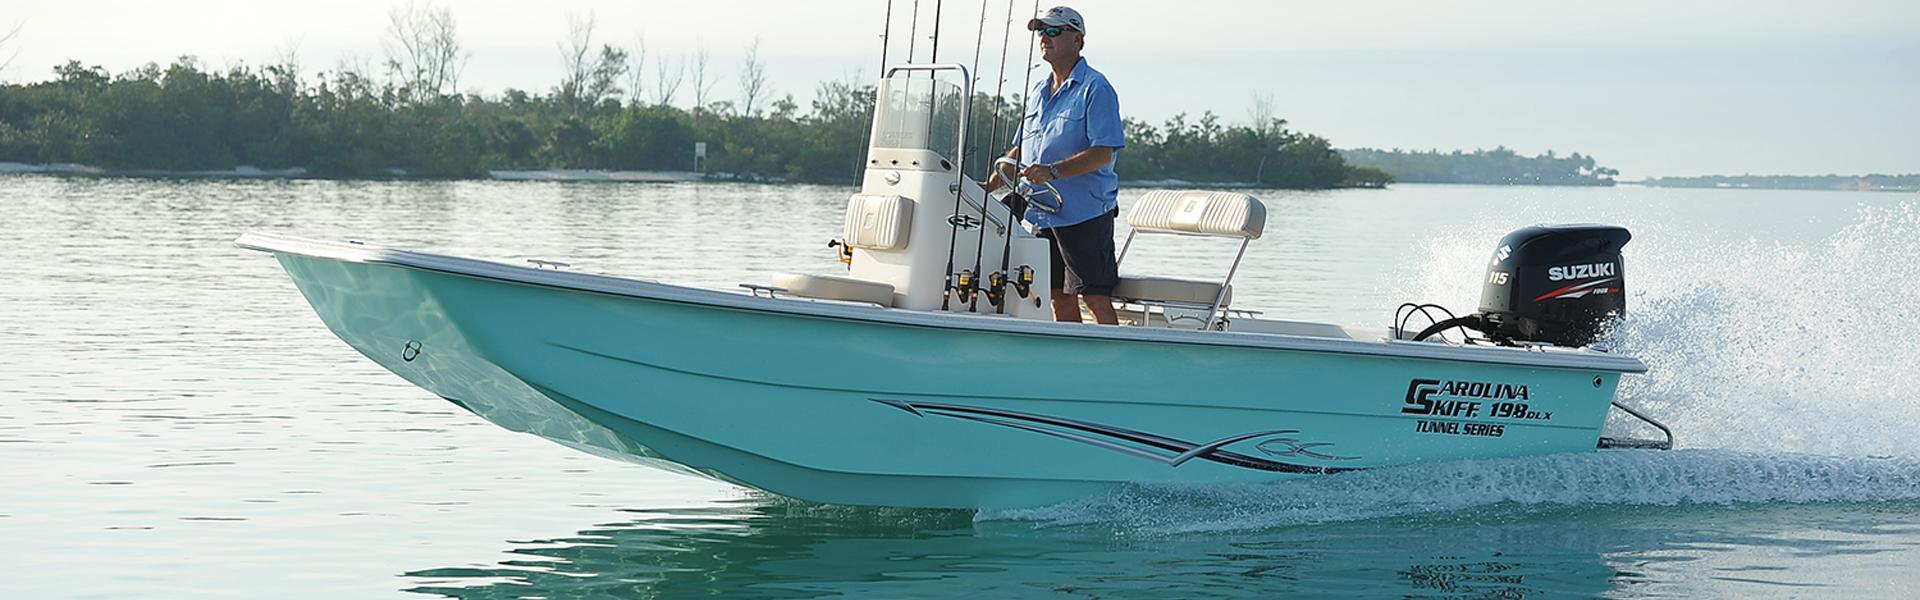 Carolina Skiff Boats for sale Jacksonville FL